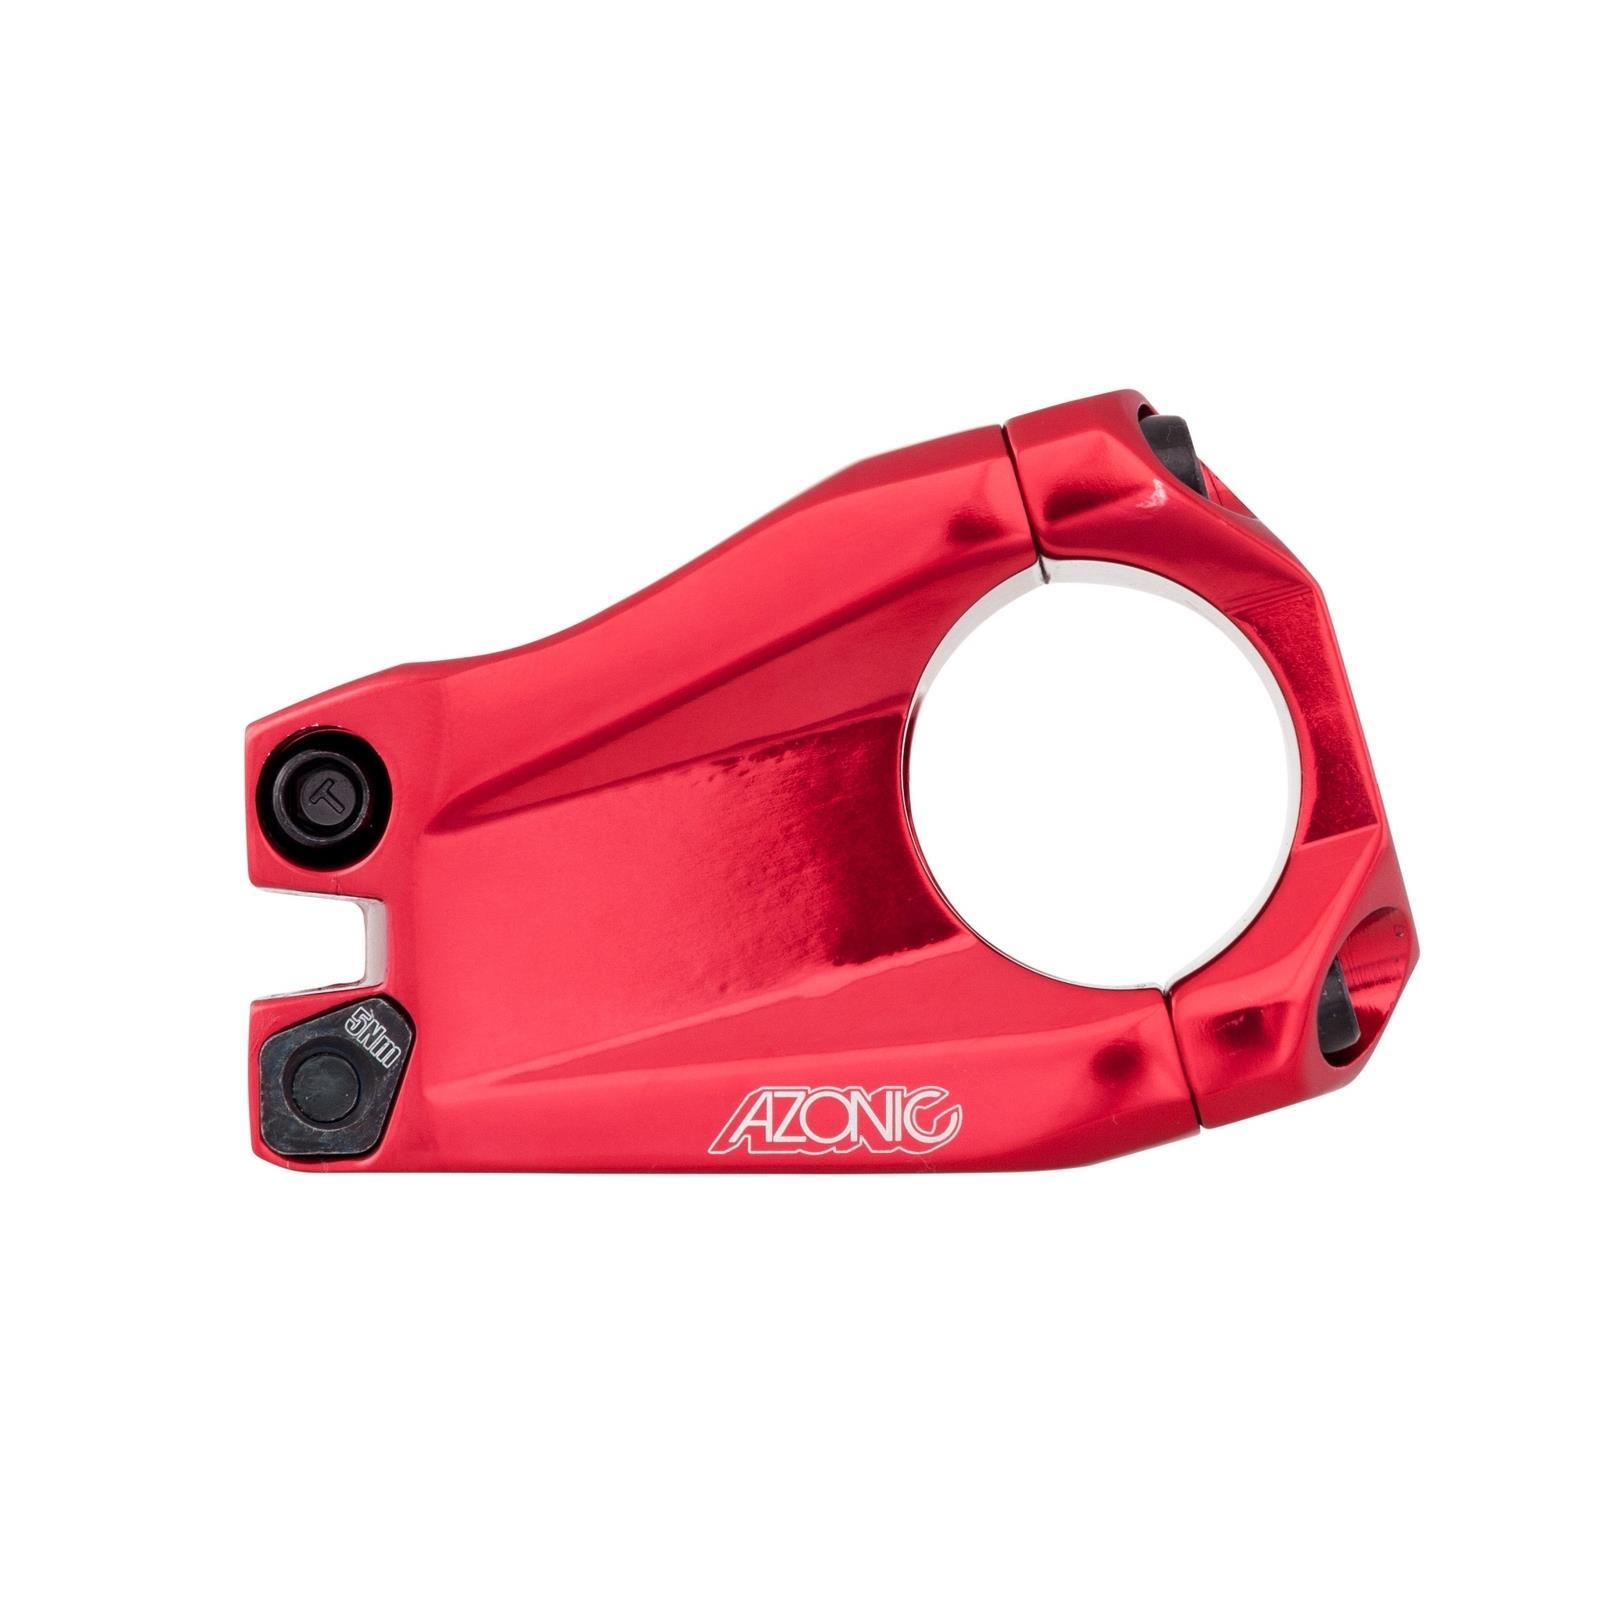 Azonic Gargiulo EVO Potence Vélo Guidon Serrage Aluminium Support 31,8 mm 40 mm